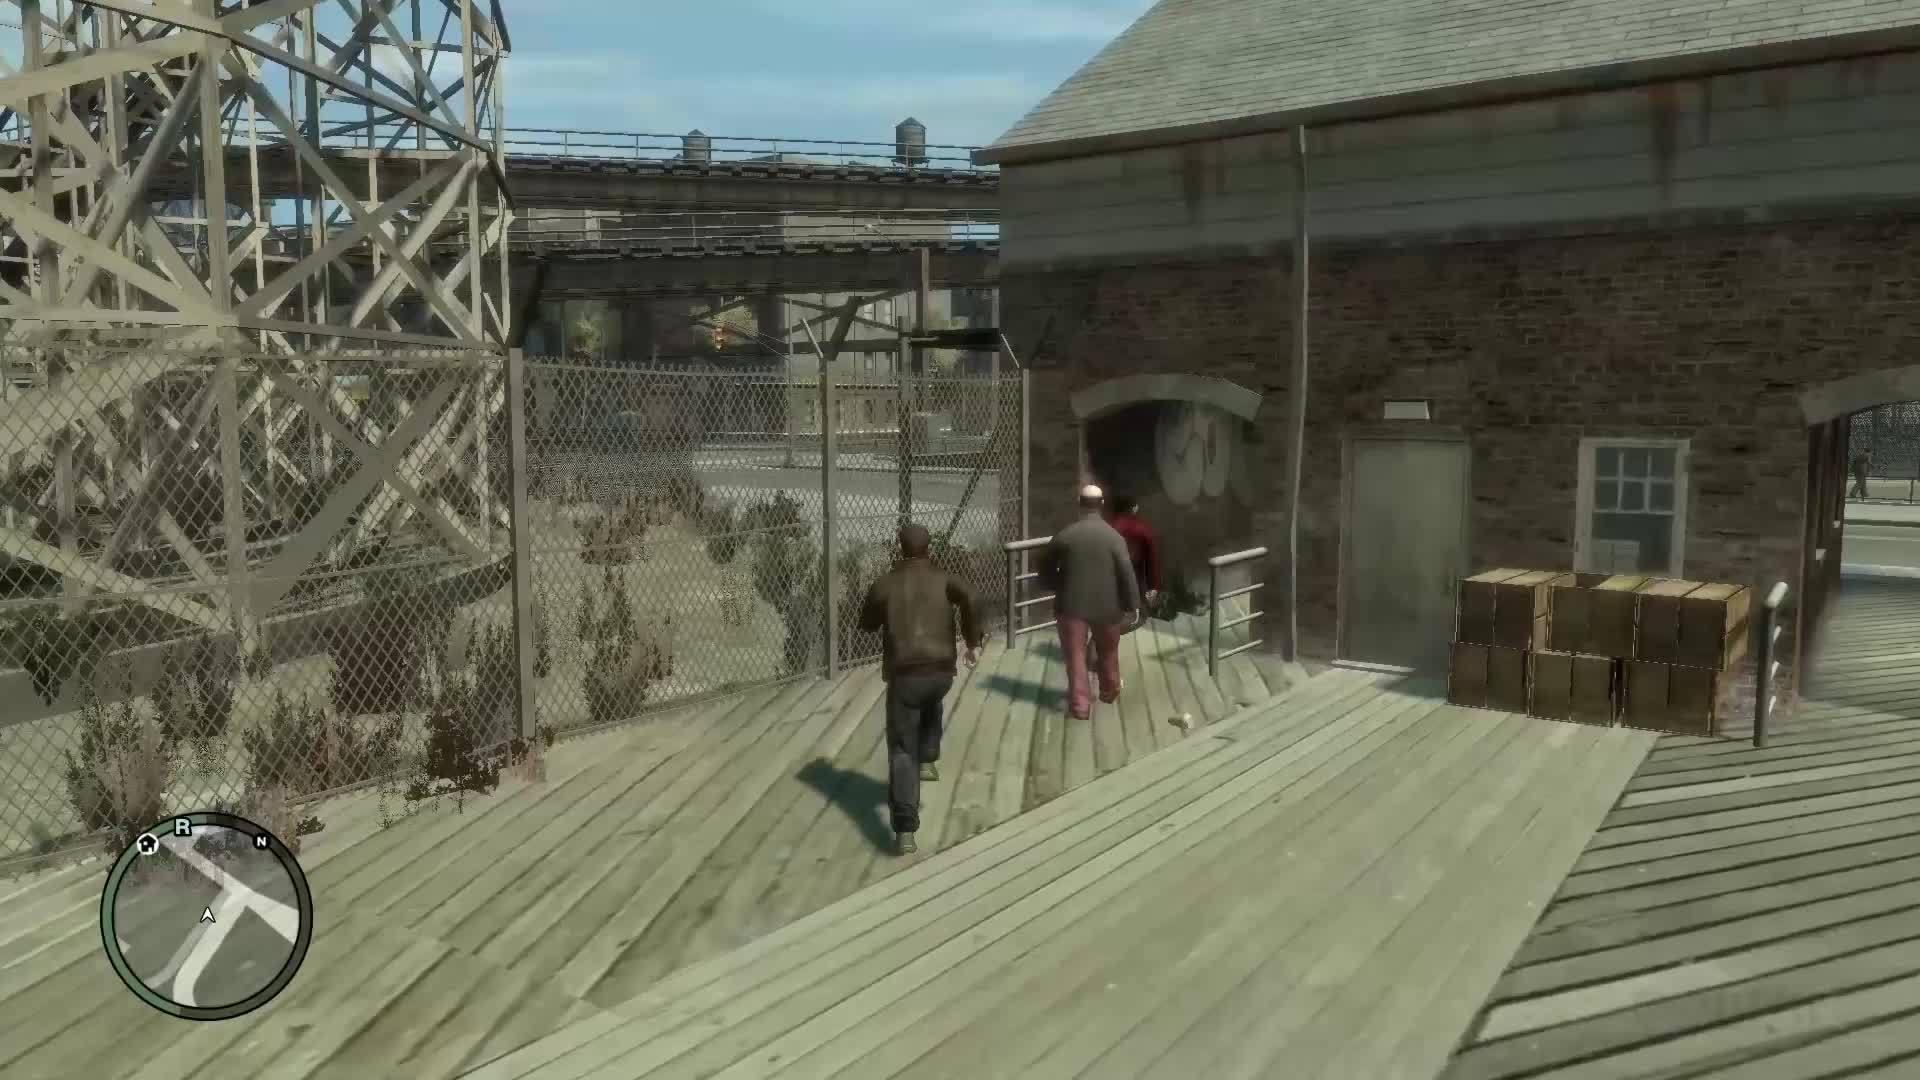 60fpsgaminggifs, [GTA4] Unexpected Smoothness (reddit) GIFs